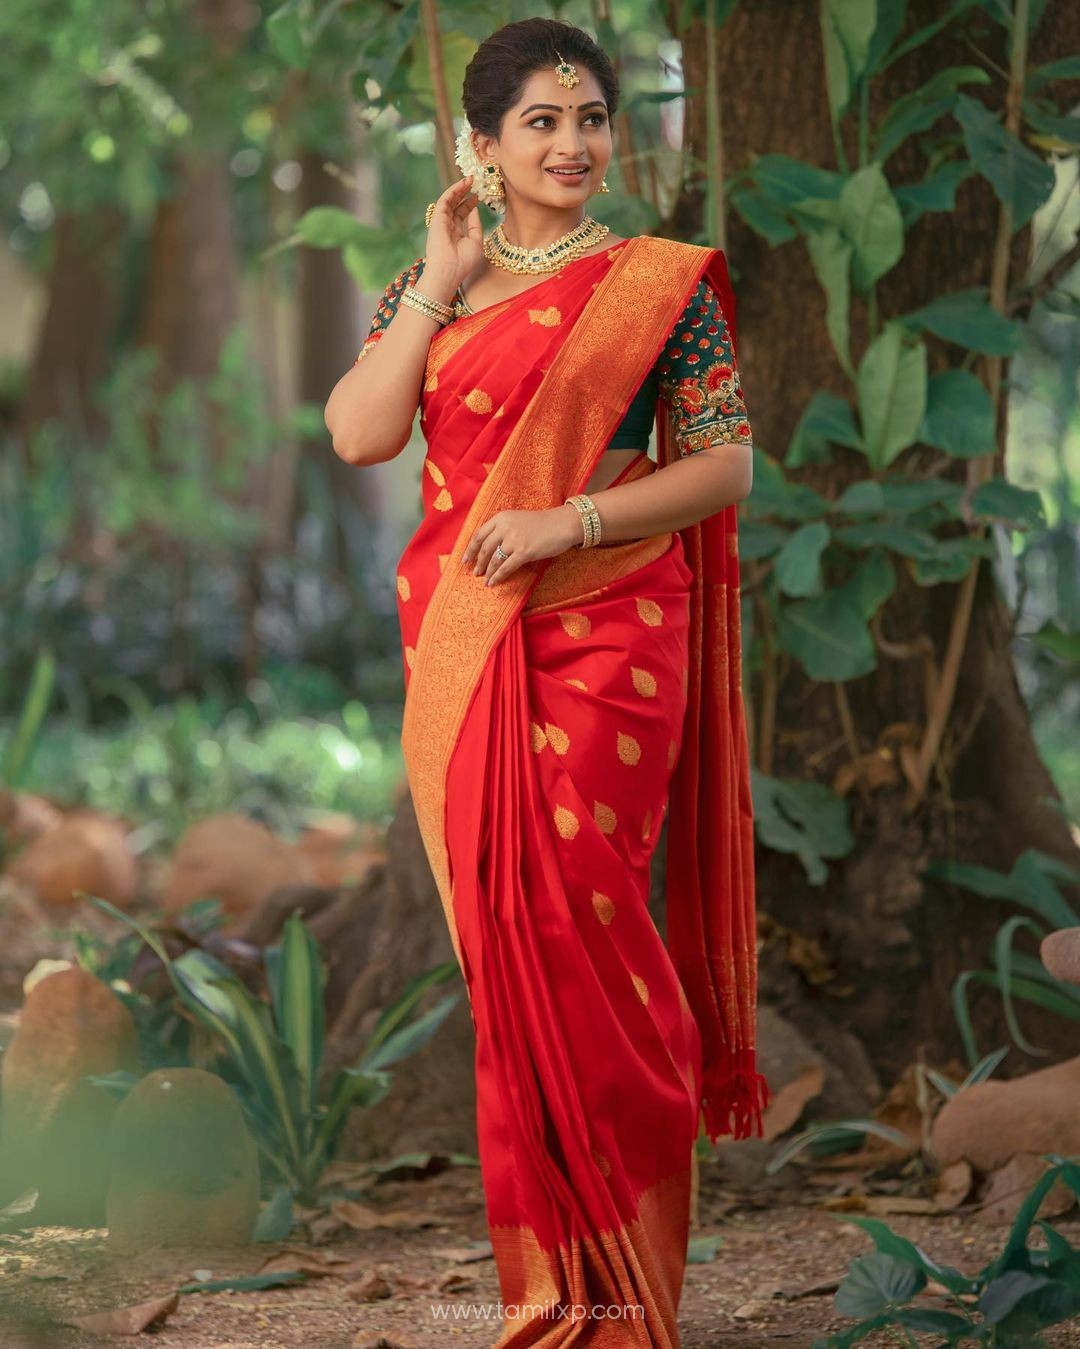 Actress Nakshathra Saree stills